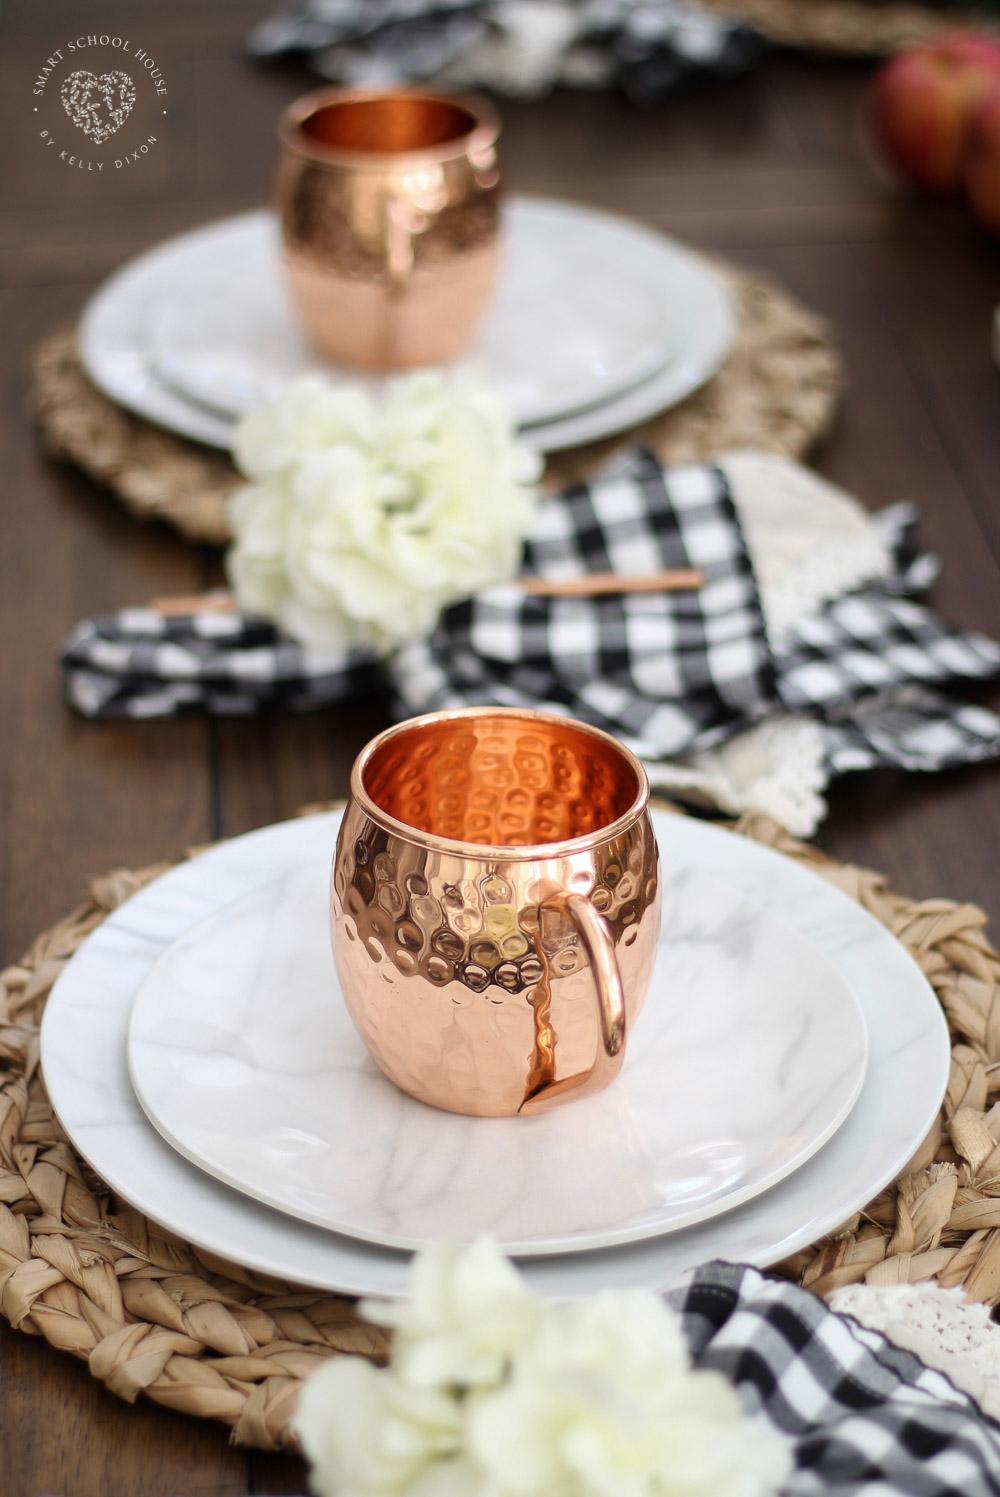 Fall tablescape idea. DIY fall table decor. Moscow mule mugs. Marble plates. Buffalo check napkin with floral napkin rings. #falldecor #falltablescape #homedecor